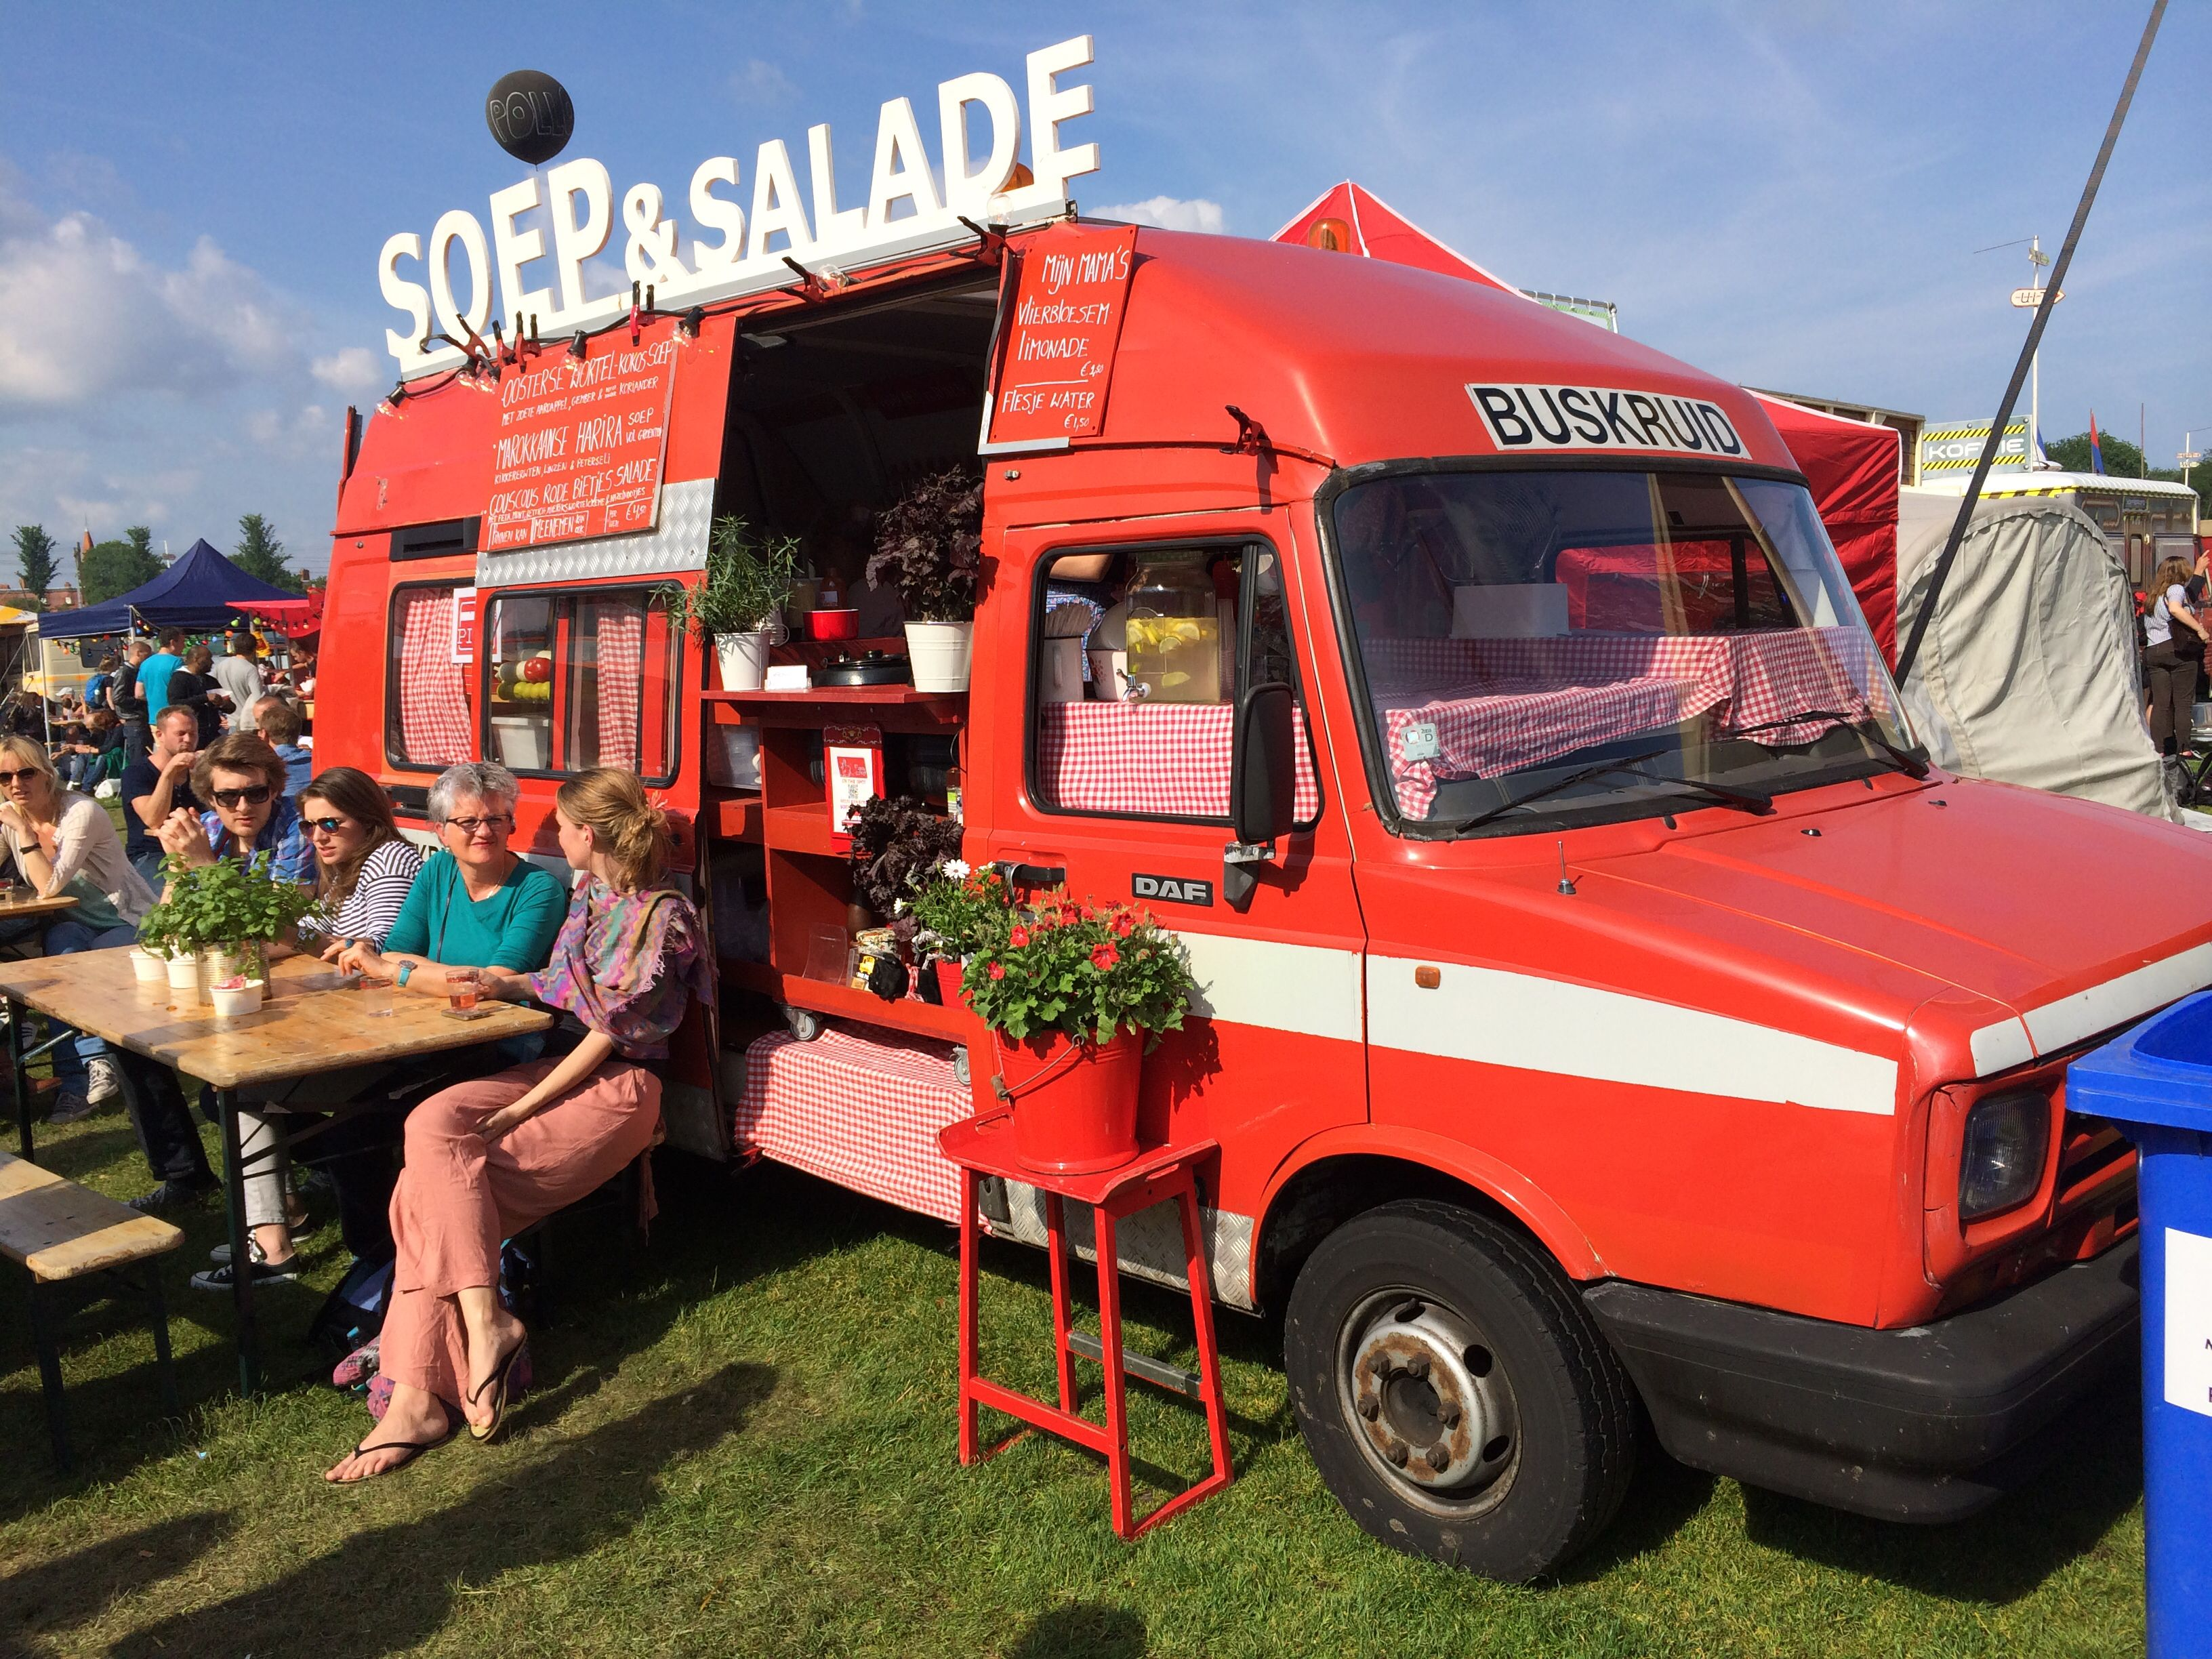 Rollende Keukens Amsterdam : Soep salade rollende keukens amsterdam rolling kitchens